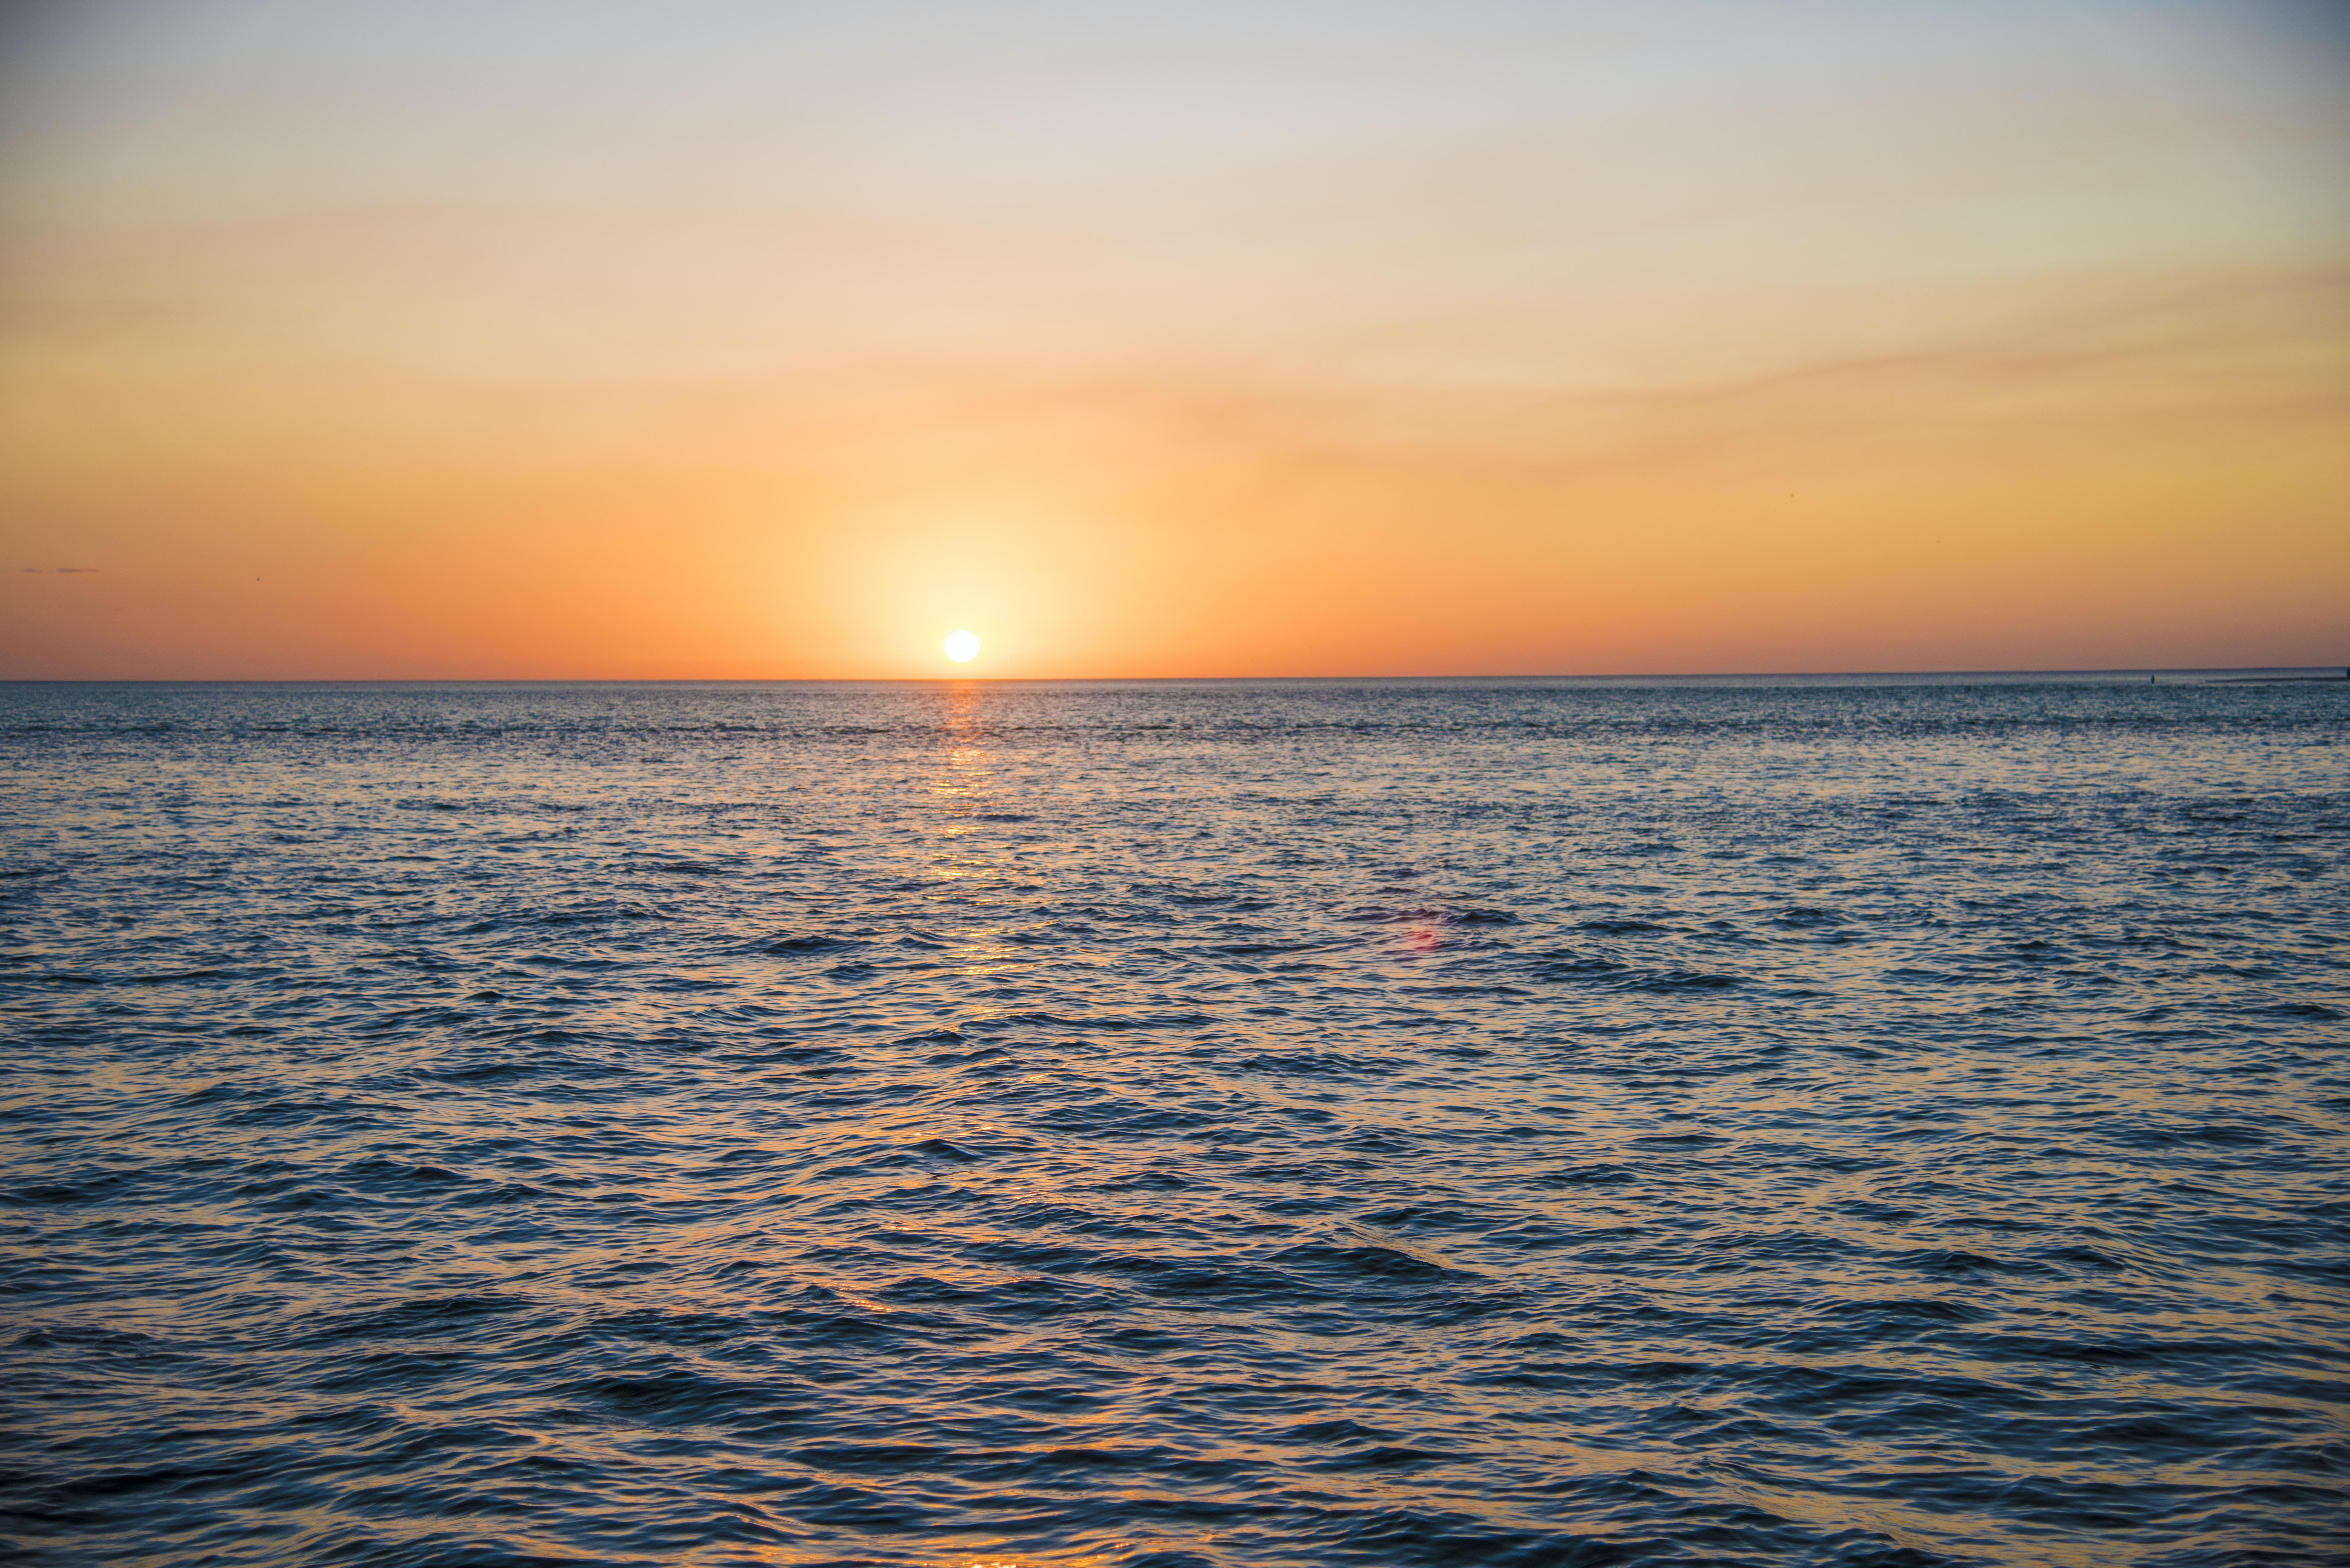 ocean water during sunset